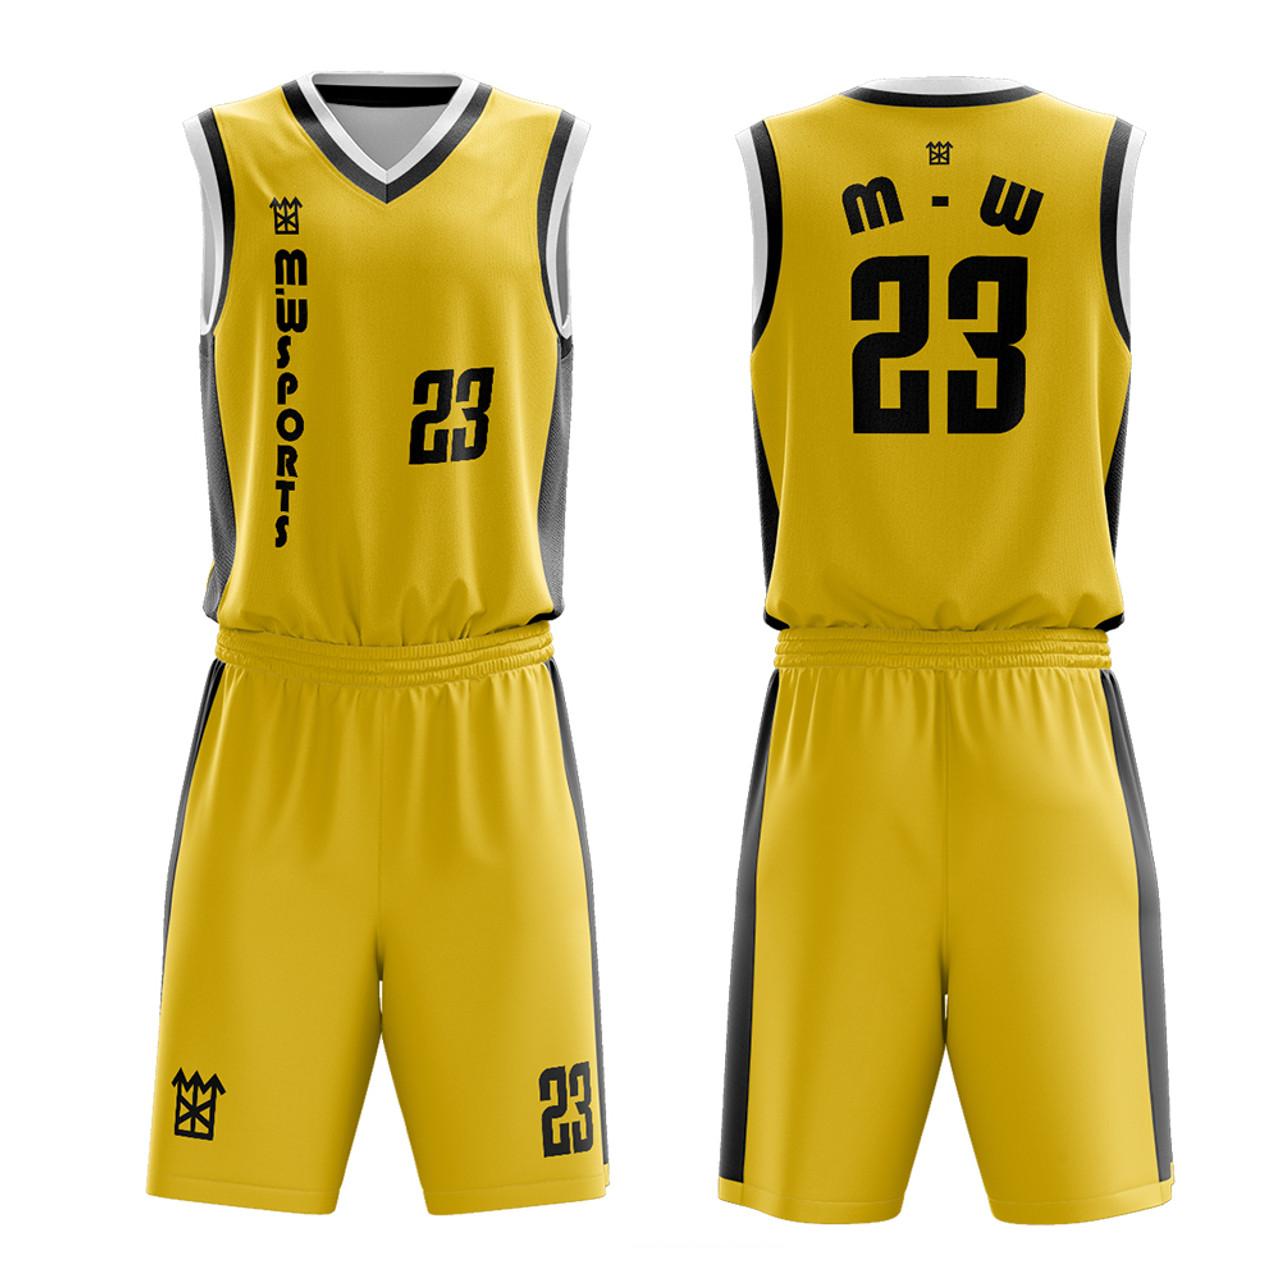 Custom Reversible Basketball Jersey ** Team Uniforms ** Sleeveless Jerseys